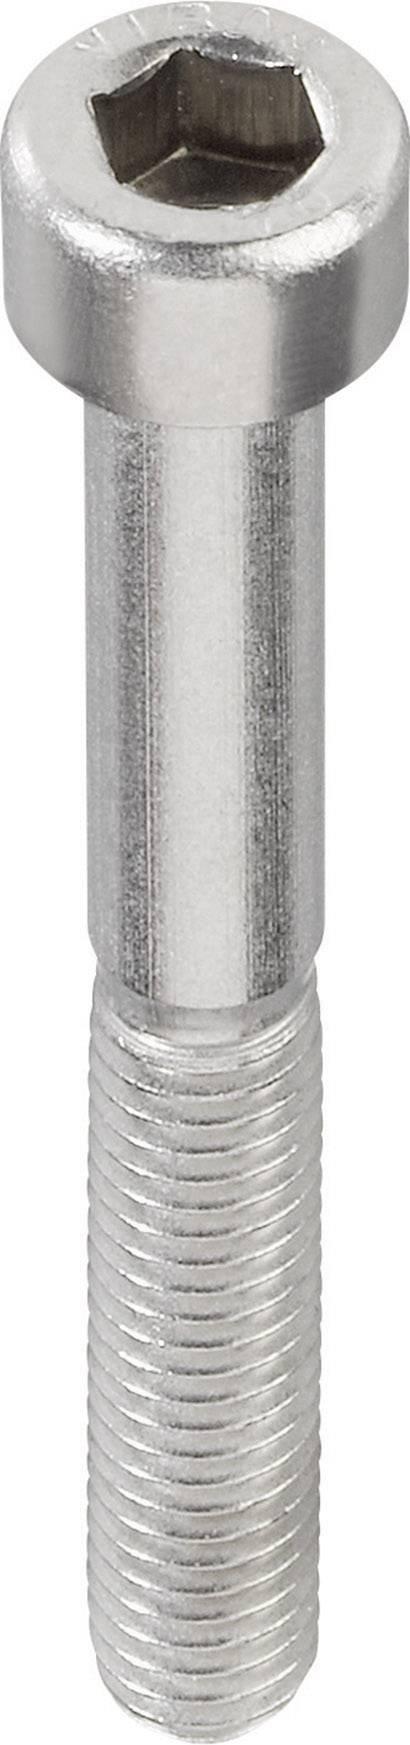 50 St Innensechskantschrauben  DIN 912 2x12  M2 EDELSTAHL V2A  M2x12